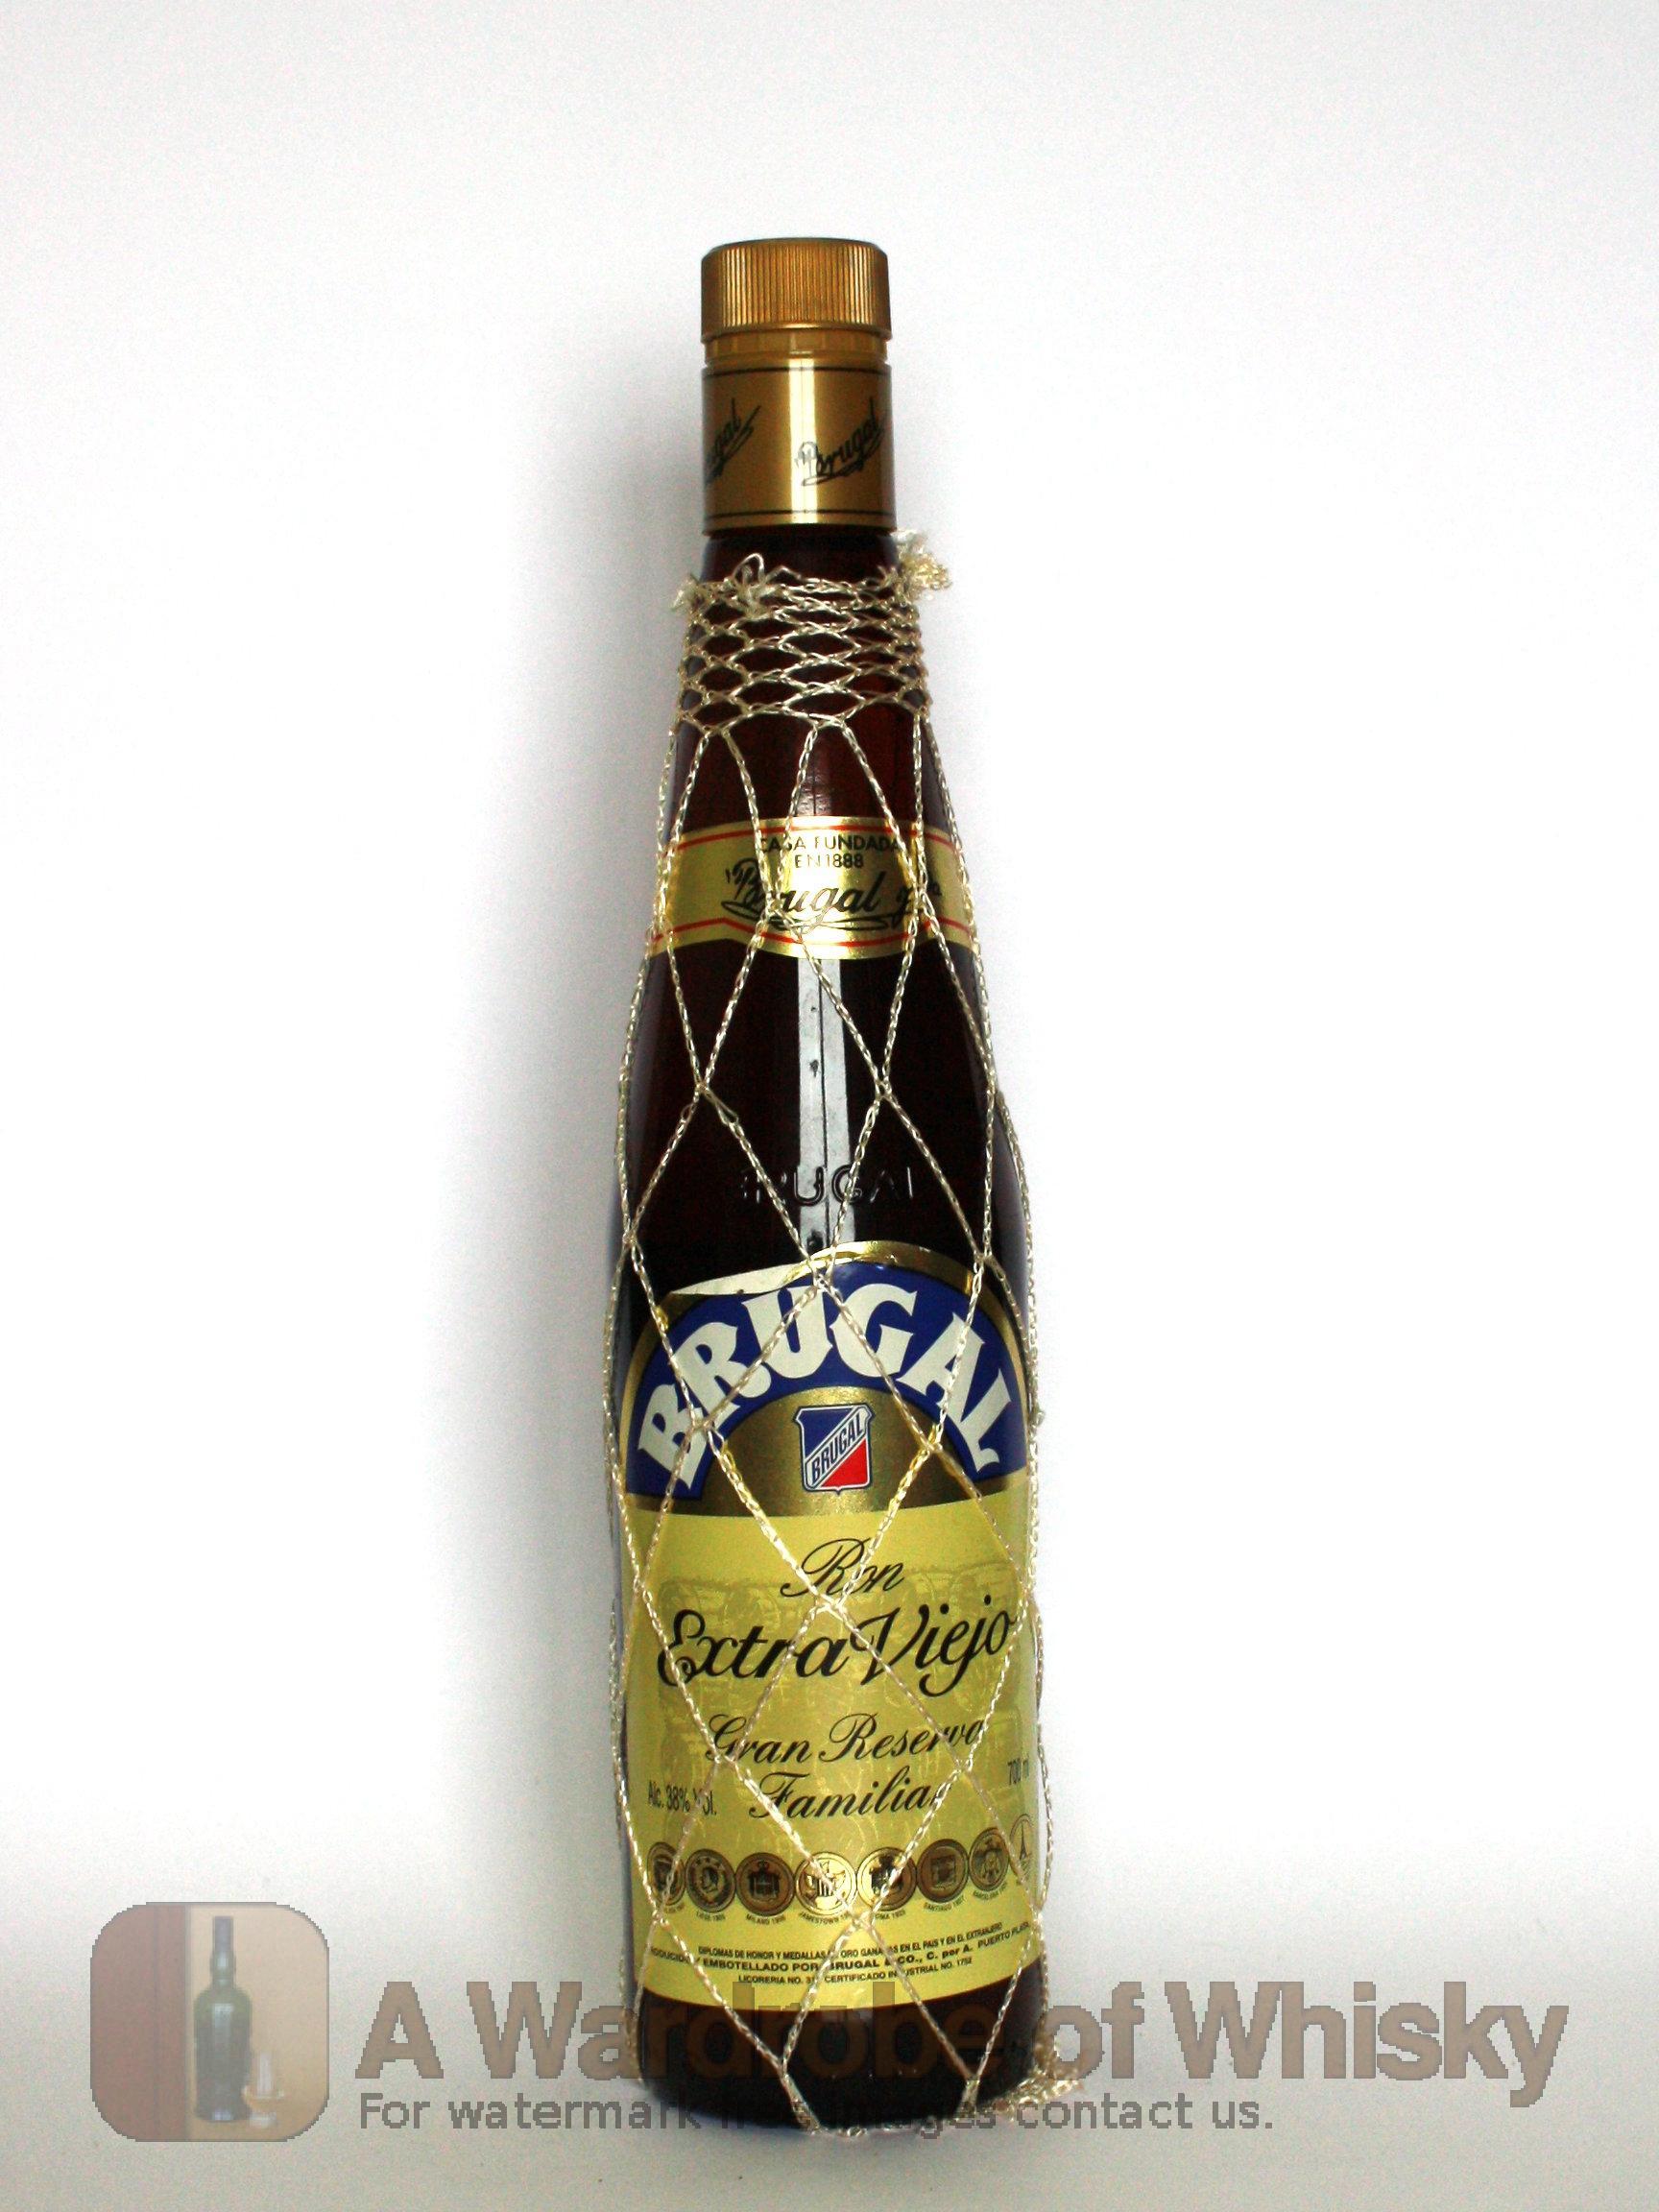 Buy Brugal Ron Extra Viejo Rum - Brugal | Whisky Ratings ... Best Irish Whiskey